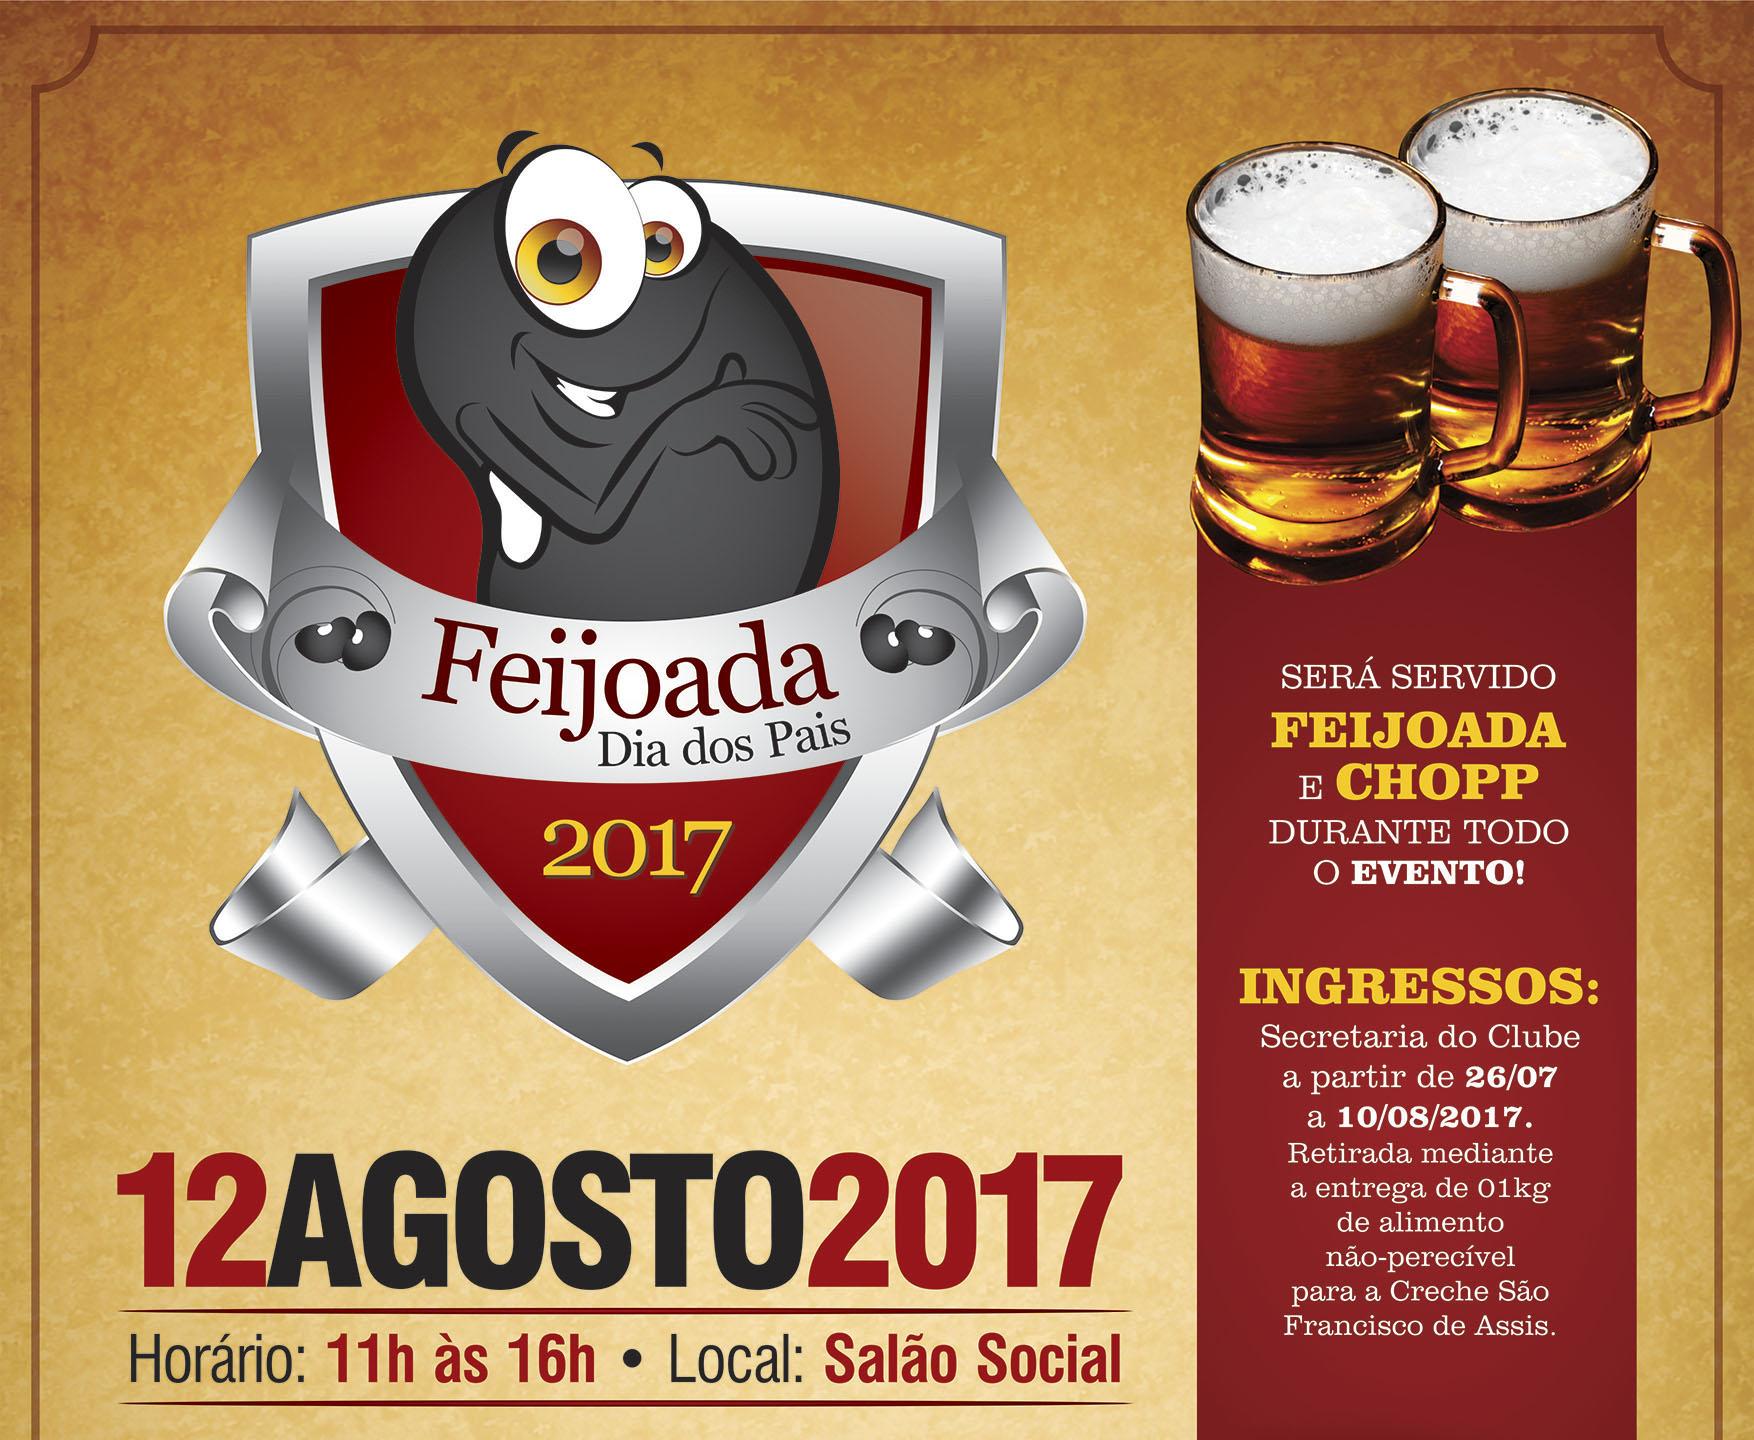 Cartaz-Feijoada-Dia-dos-Pais-20171